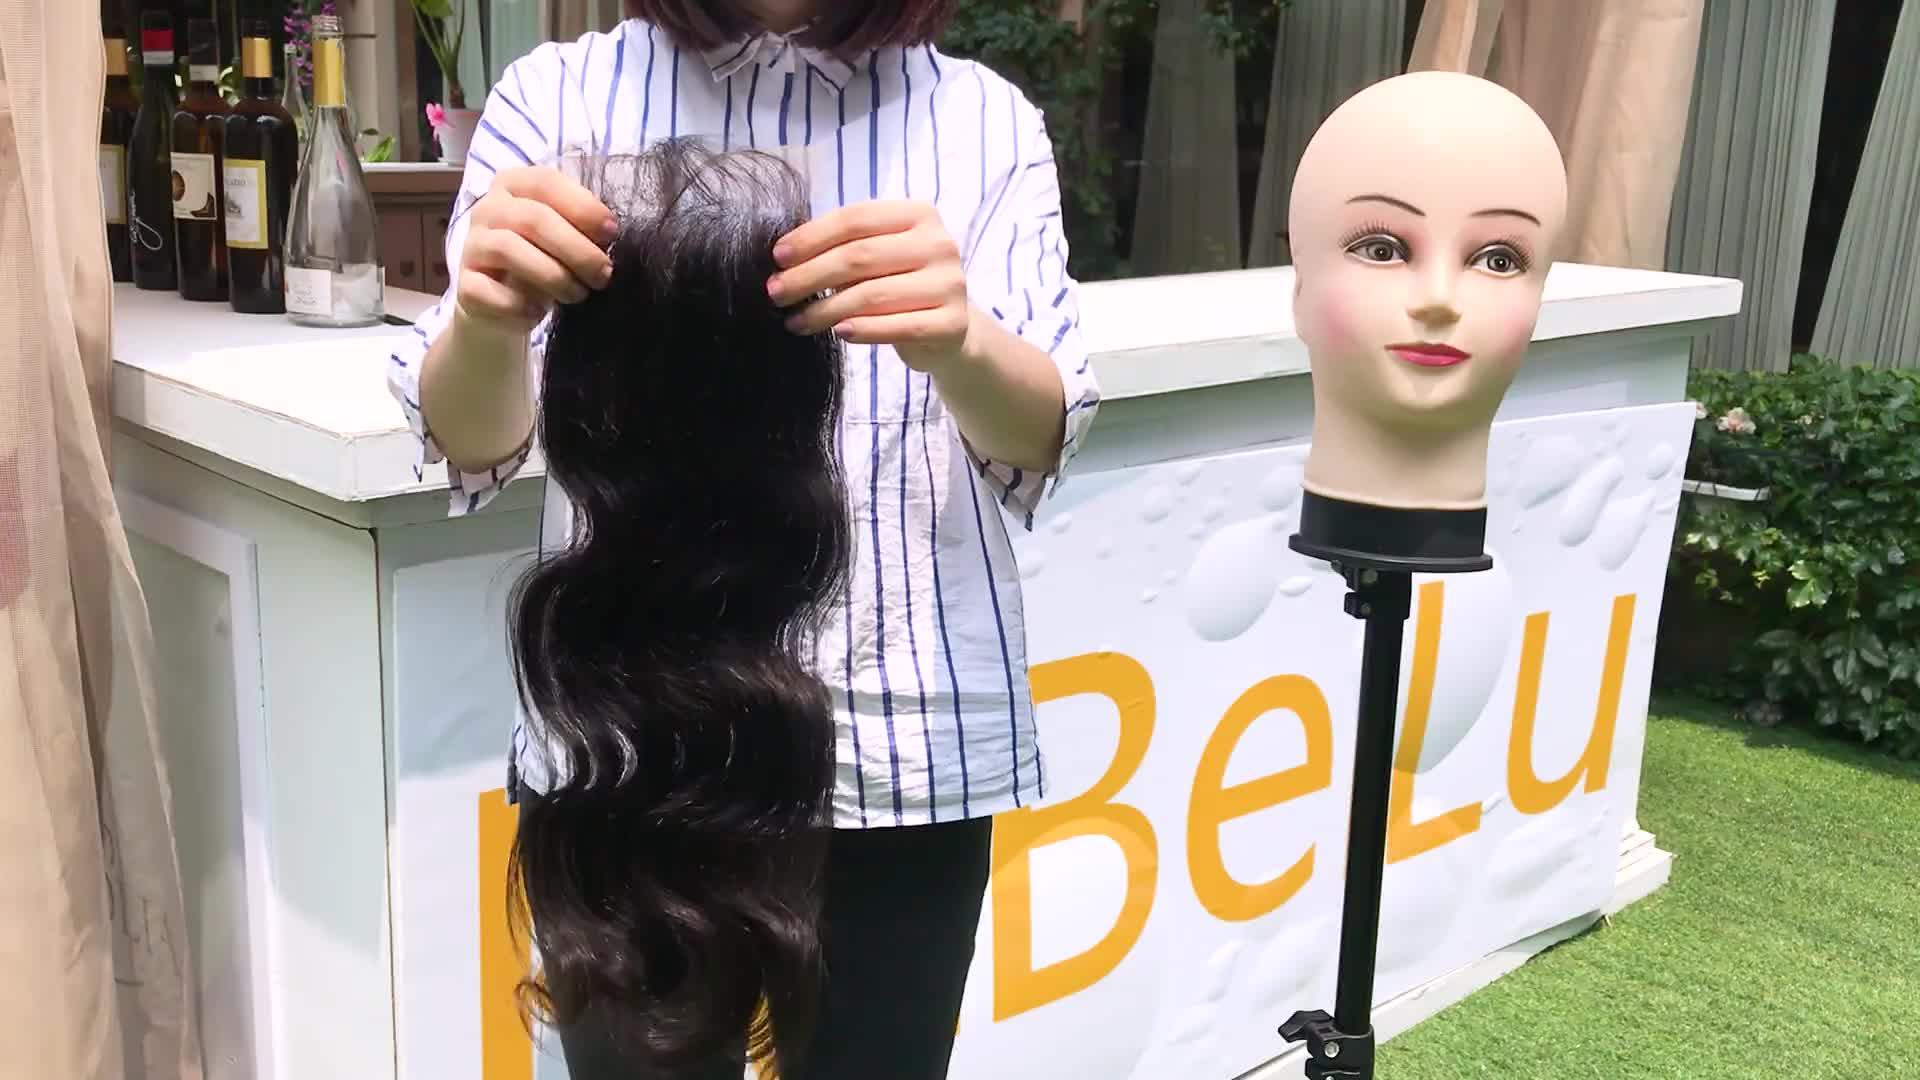 Venda quente pacote de unidades de cabelo real perucas de cabelo rendas, bioskin virgem peruca de cabelo, topper cabelo base de seda atacado